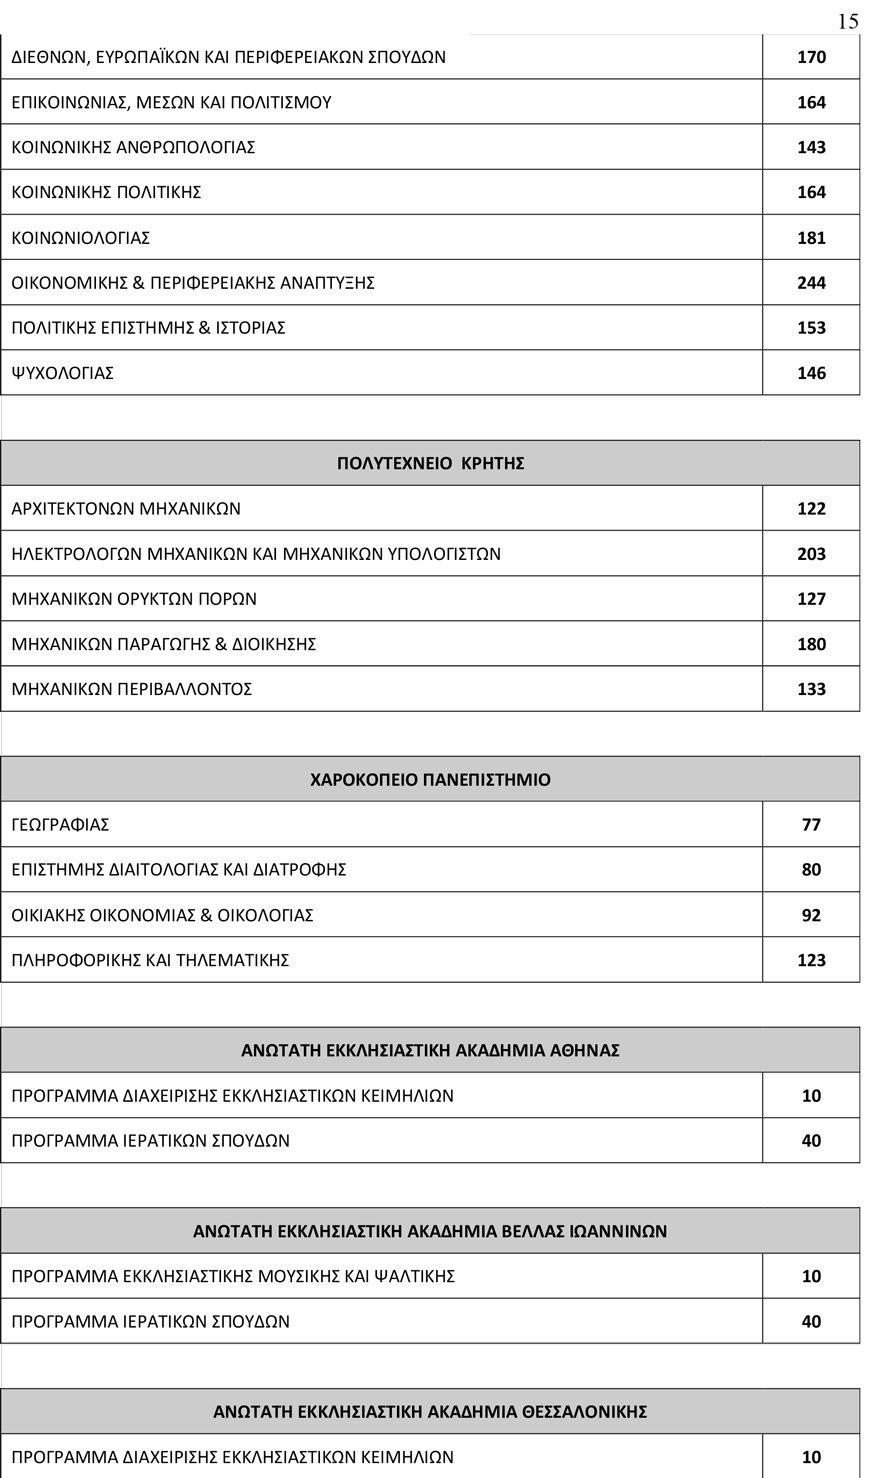 arrithmos_eisakt15 78.335 θα εισαχθούν φέτος στα Πανεπιστήμια - Αυξημένος κατά 3.500 ο αριθμός